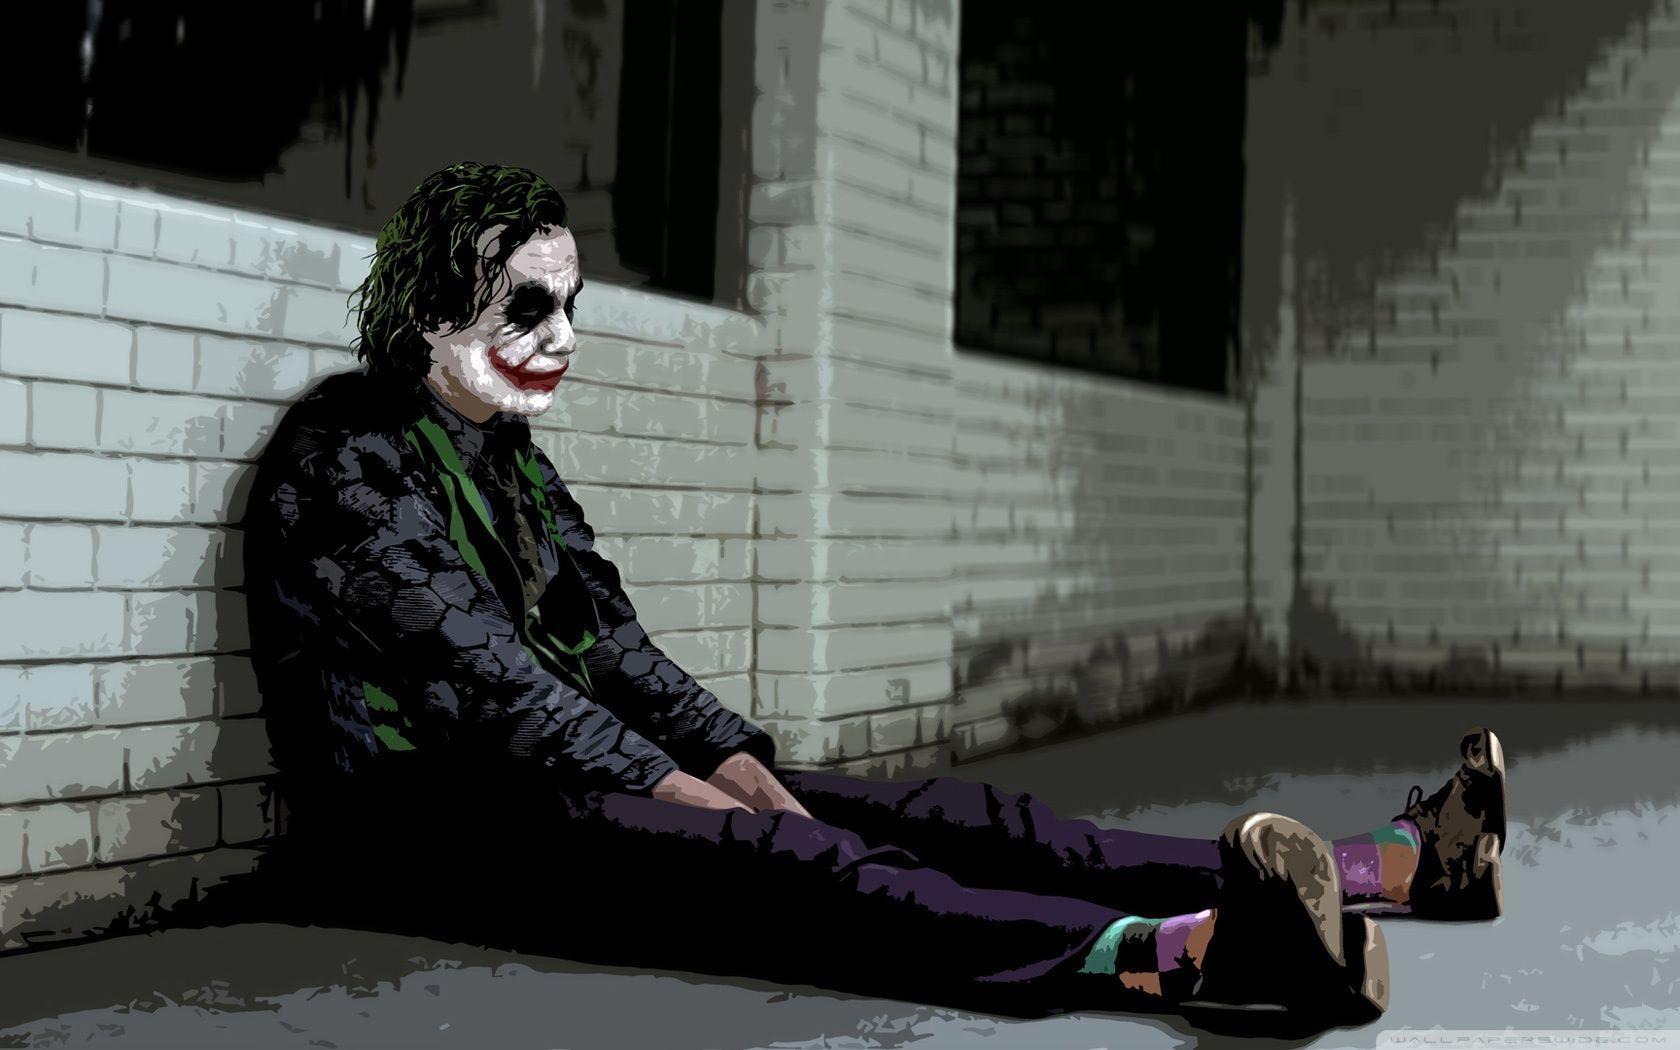 Sad Joker Wallpapers Top Free Sad Joker Backgrounds Wallpaperaccess